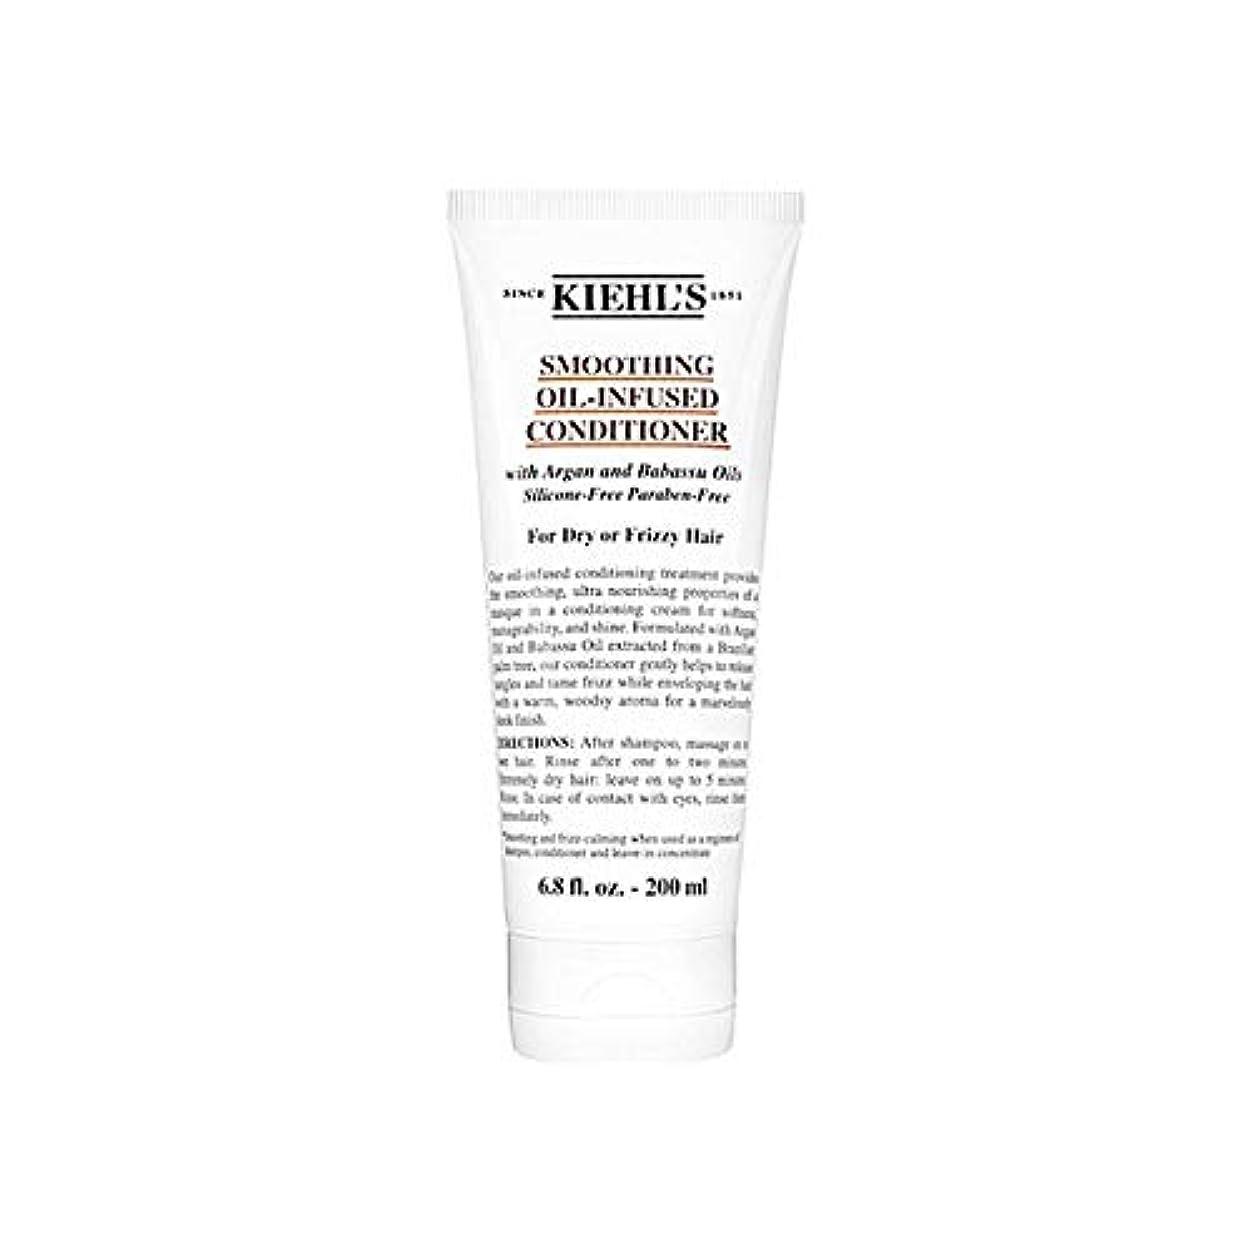 [Kiehl's ] キールズスムージングオイル注入コンディショナー200Ml - Kiehl's Smoothing Oil-Infused Conditioner 200ml [並行輸入品]